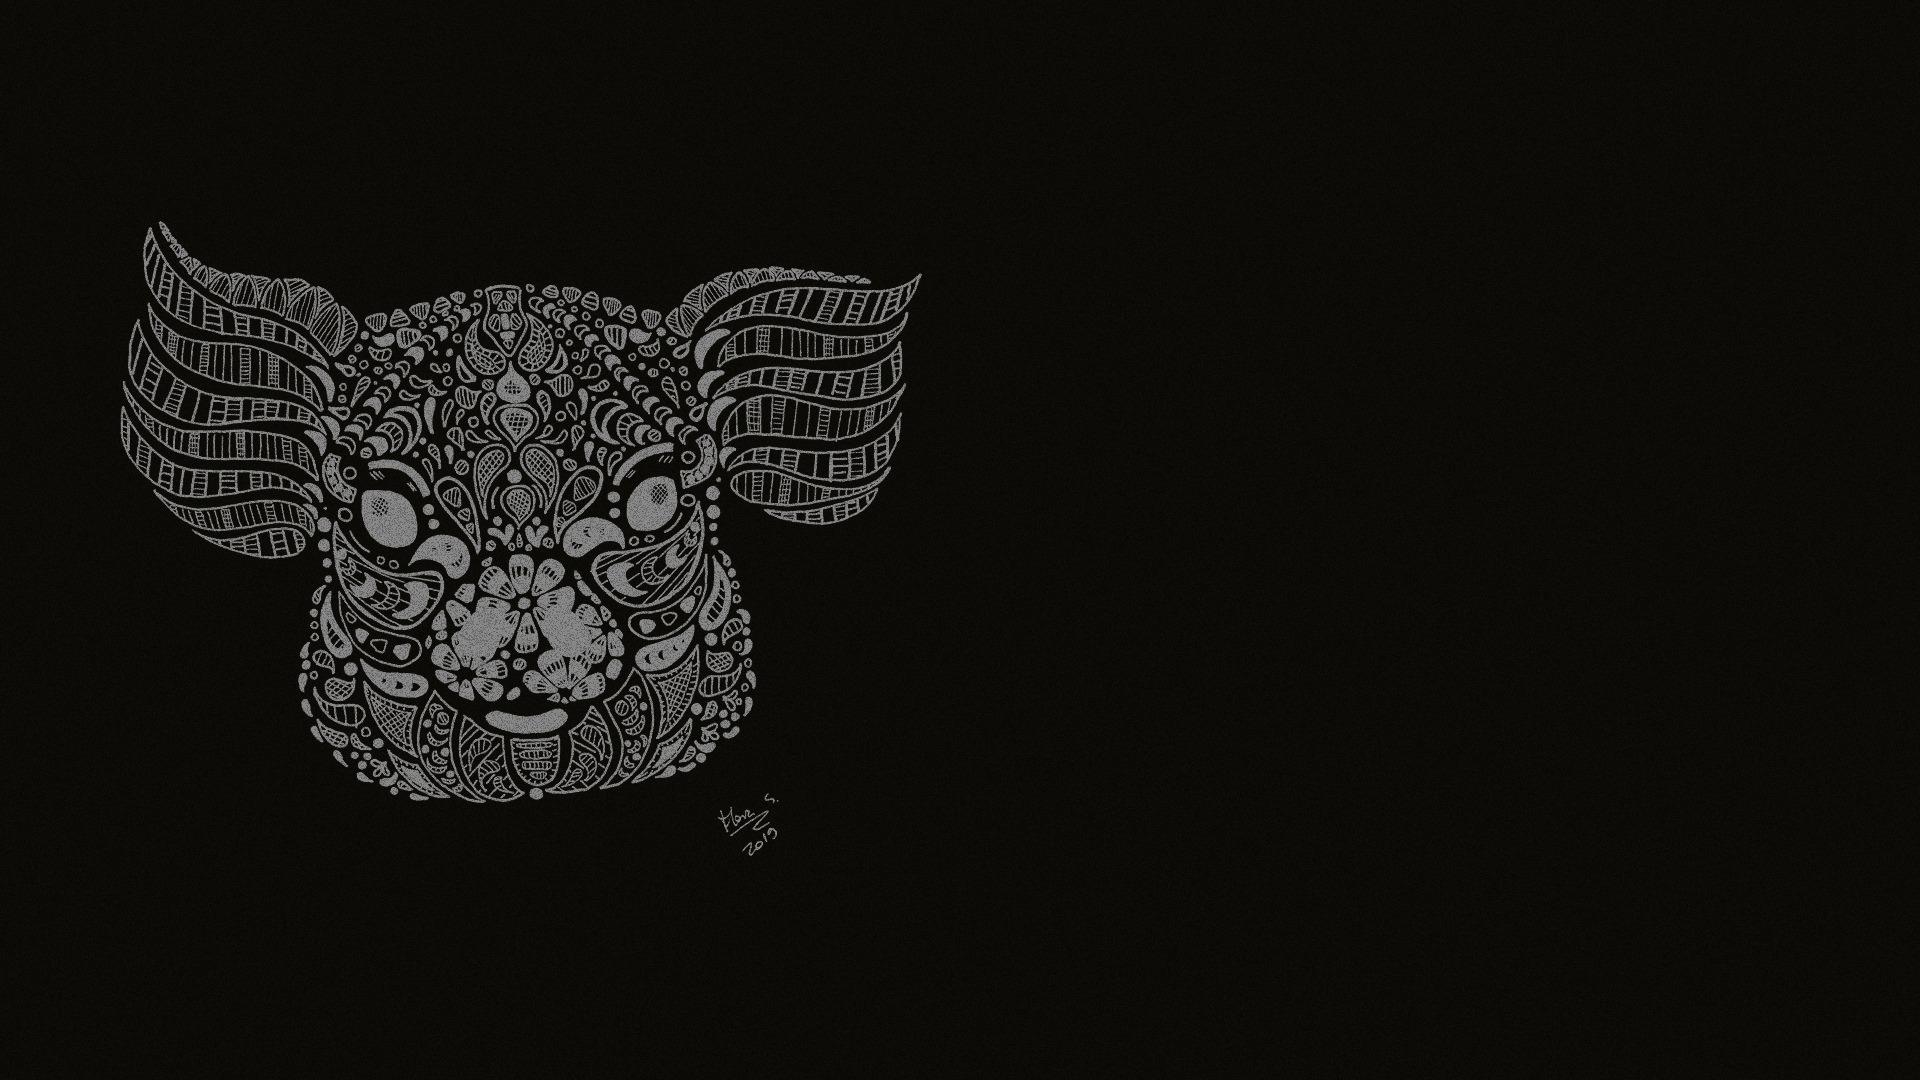 porco%252016X9_edited_edited